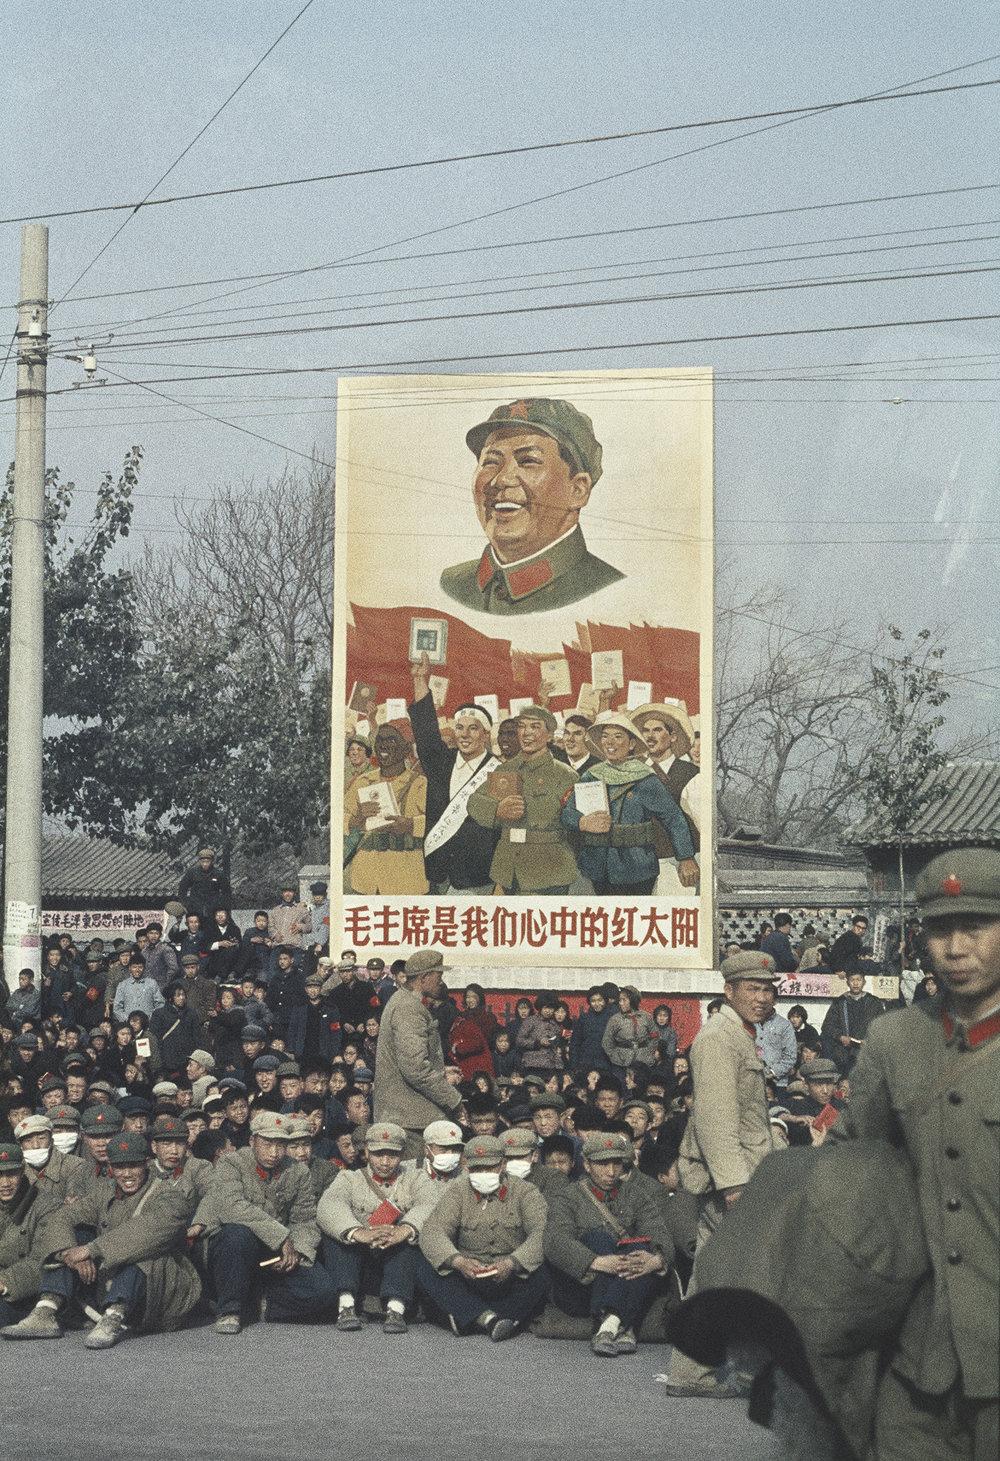 SOLANGE BRAND Untitled (a demonstration), Beijing, China, November, 1966